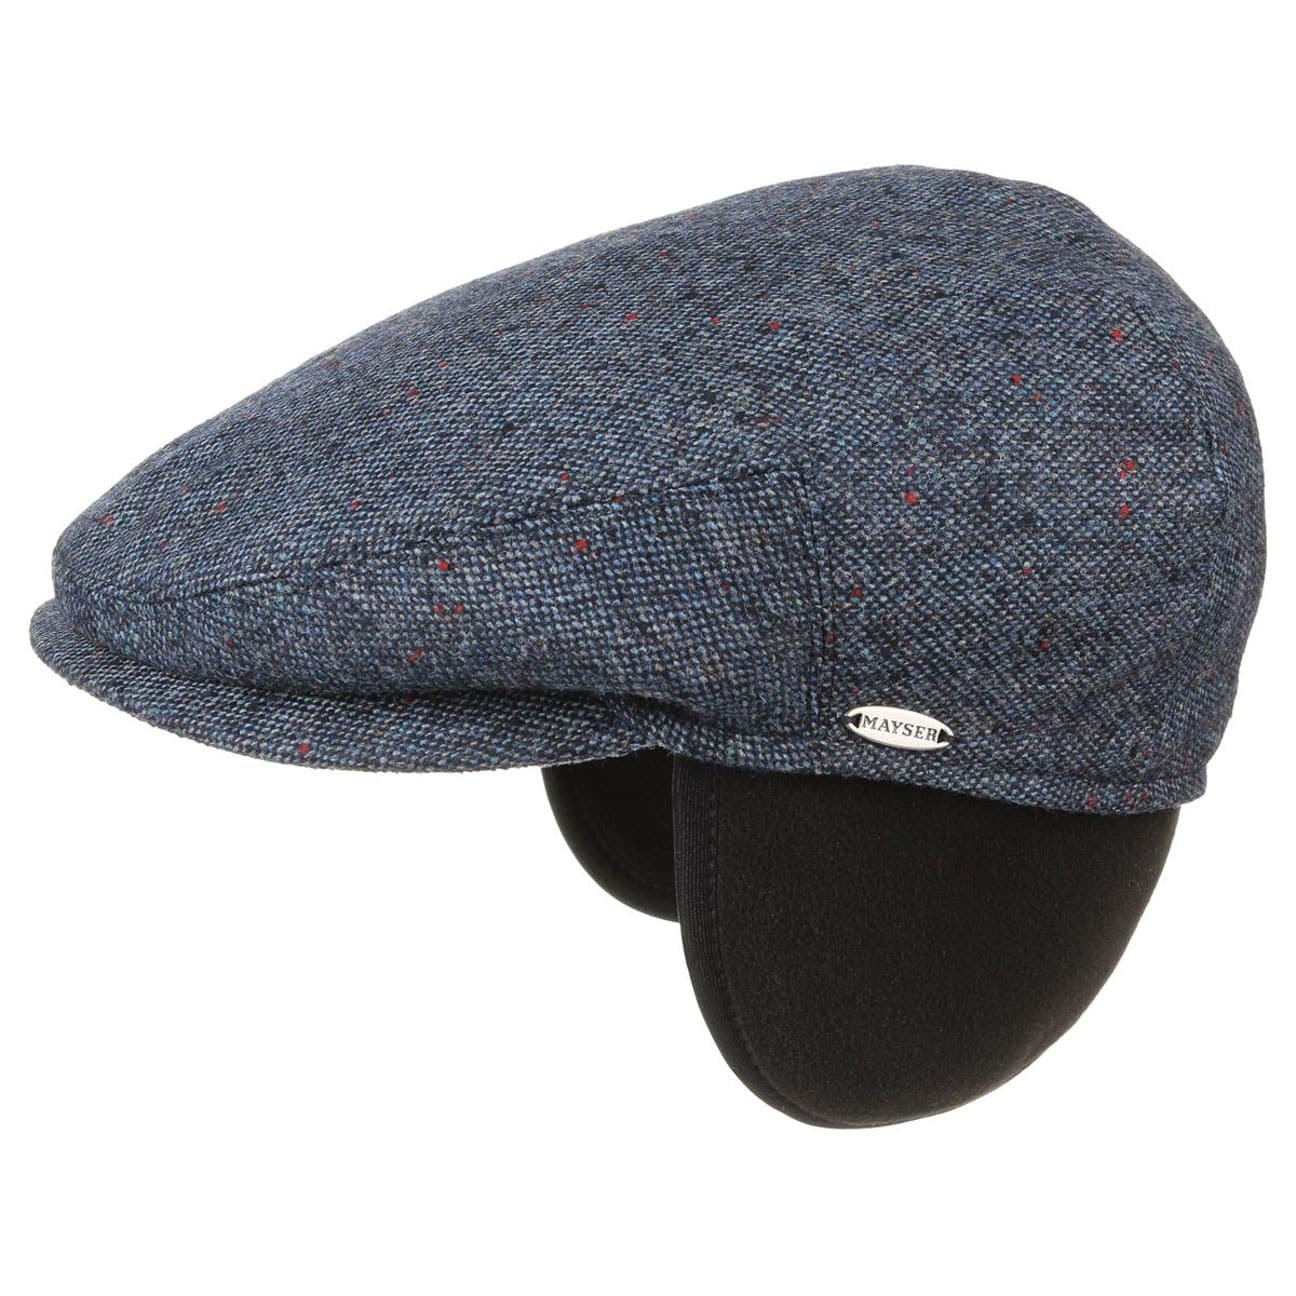 ... Earflaps Tweed Flat Cap by Mayser - blue 1 2ac6fec732c